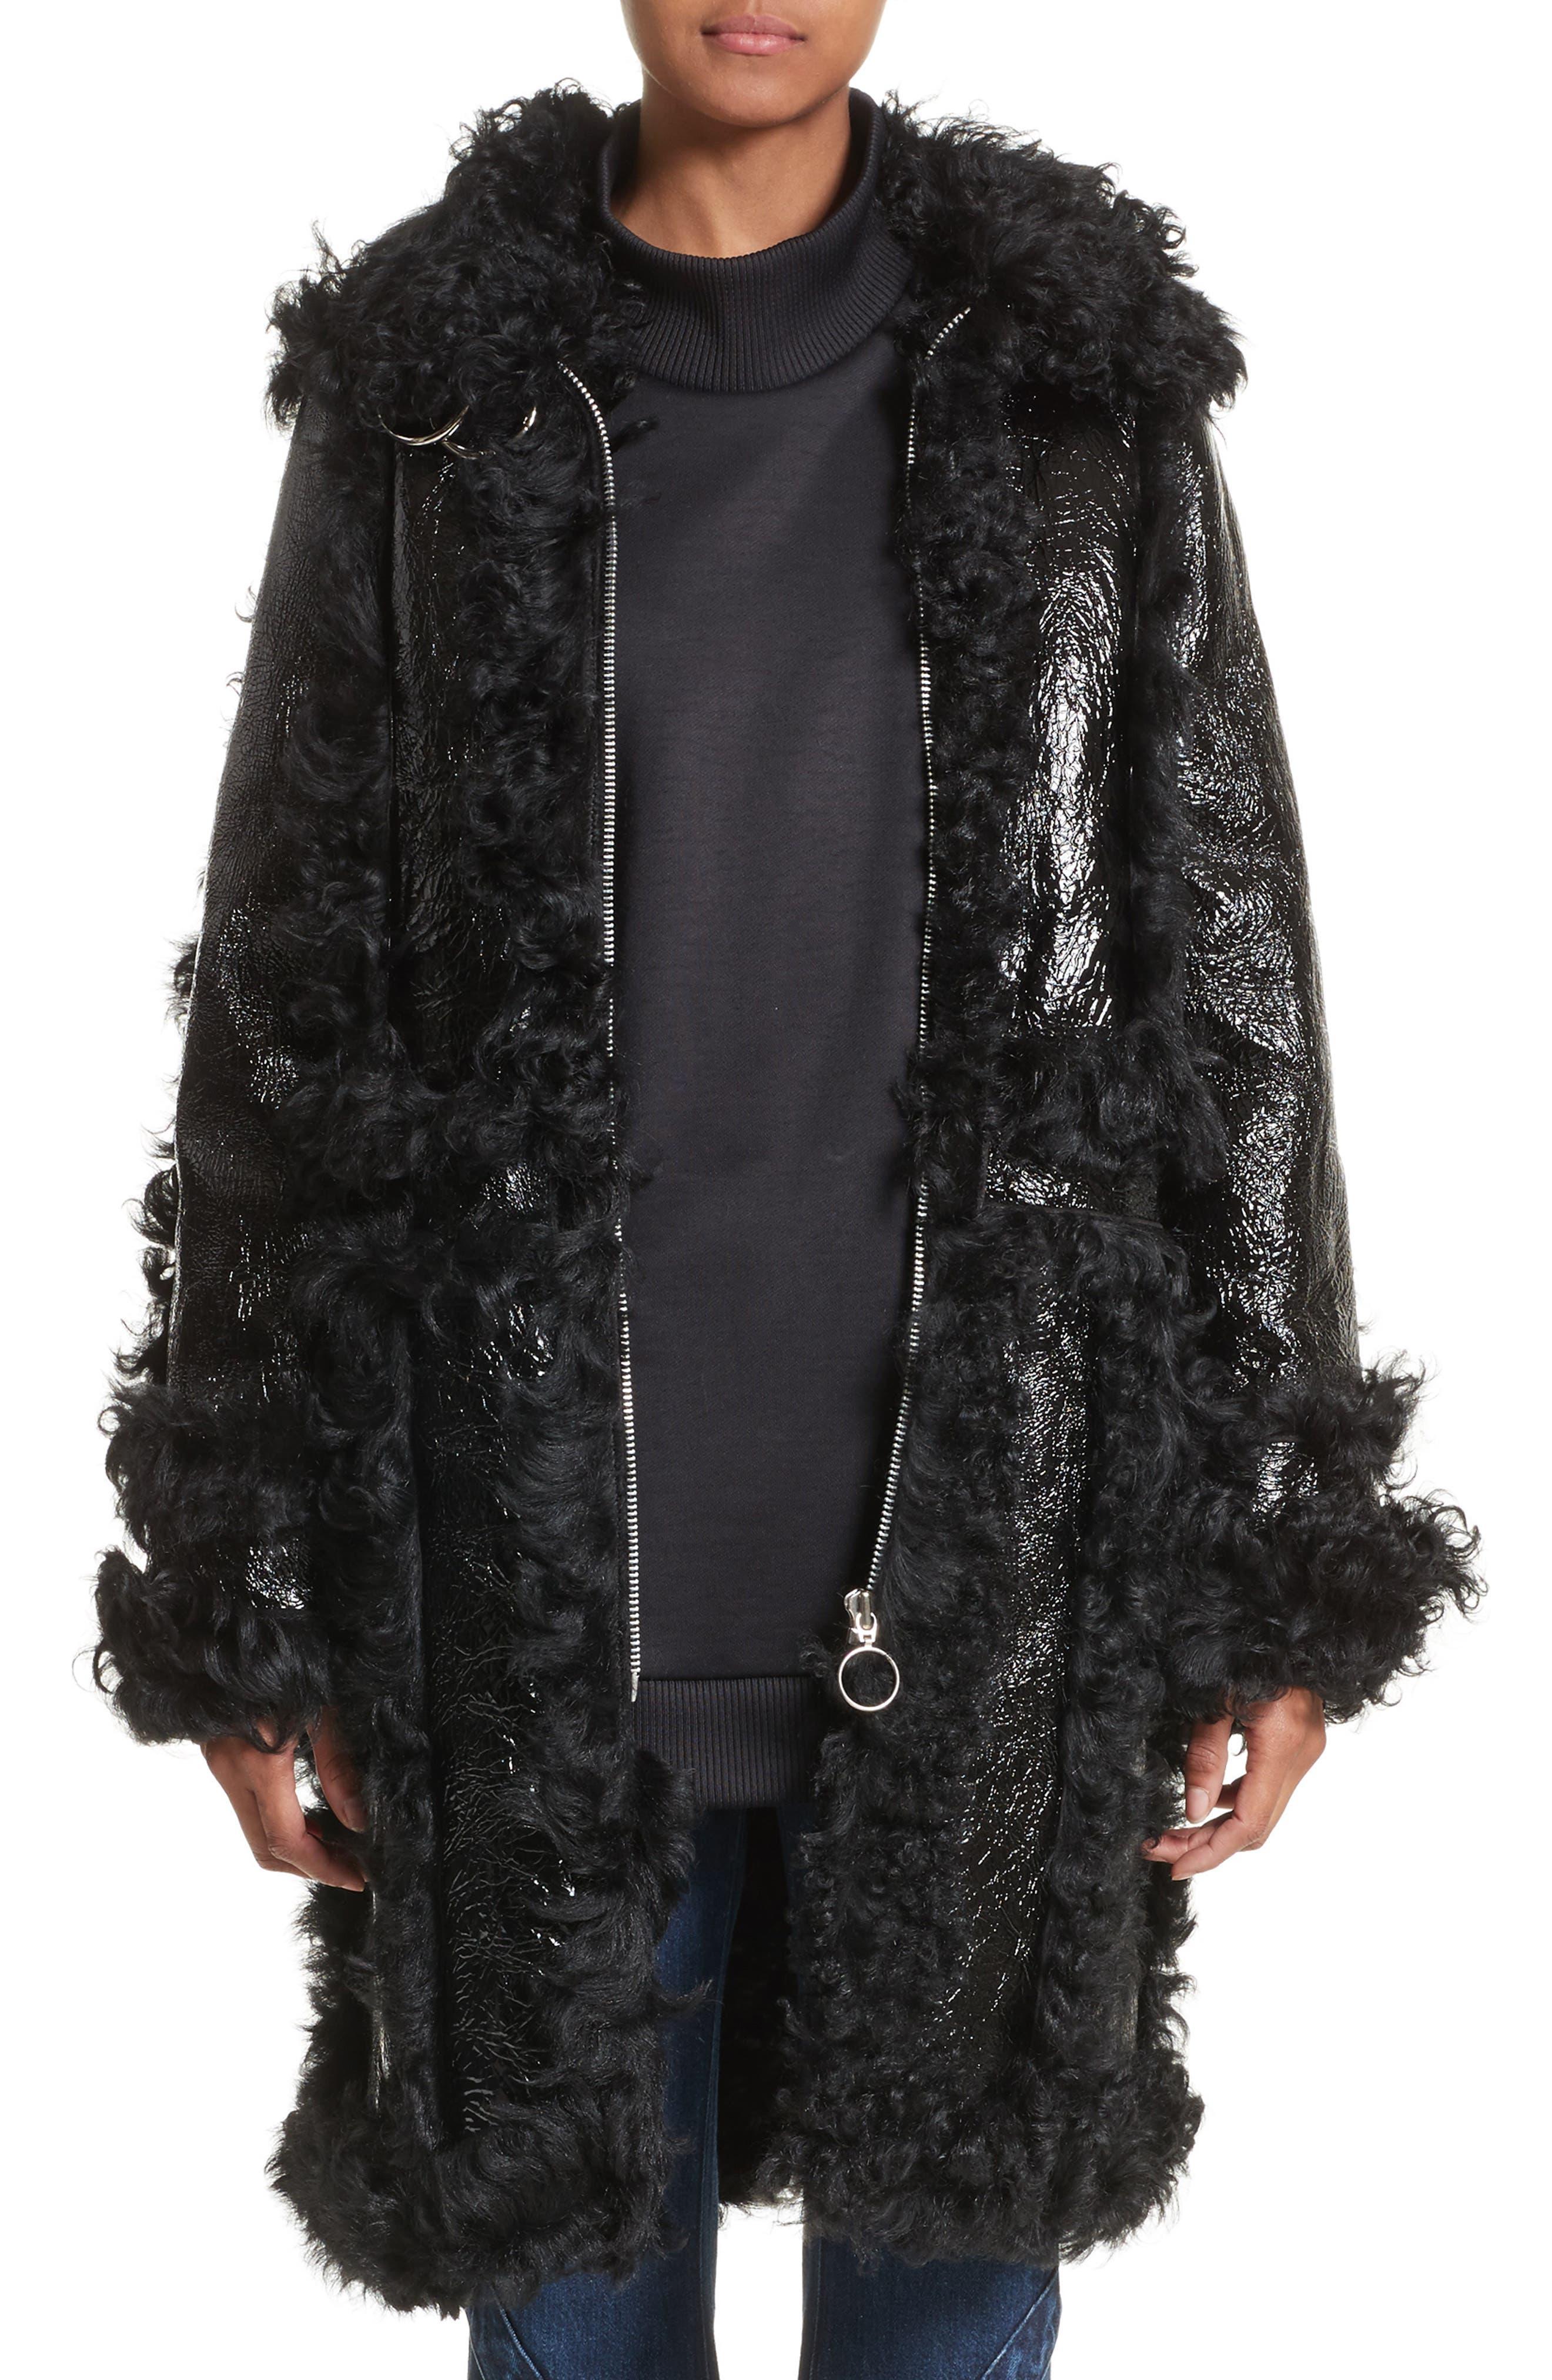 Marques'Almeida Foiled Genuine Shearling Coat,                         Main,                         color, Black/Black